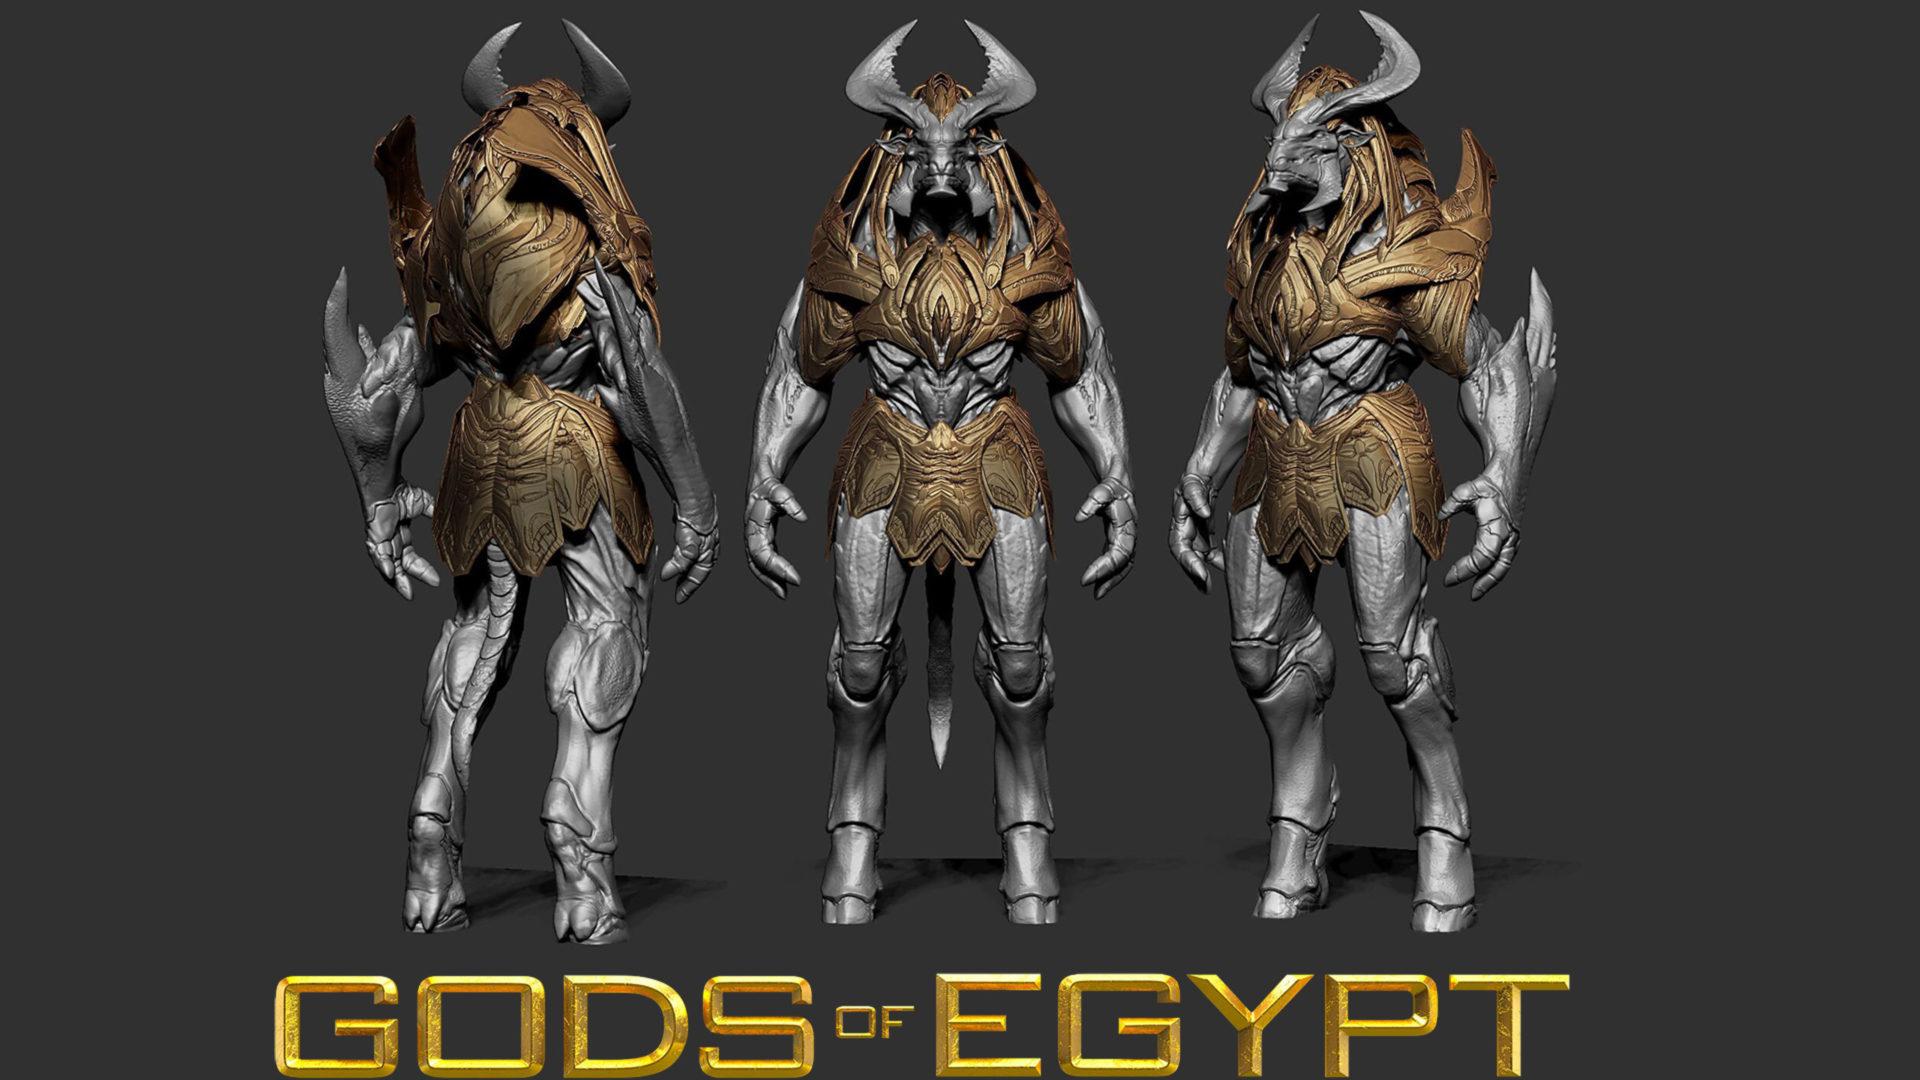 Skyrim Iphone X Wallpaper Gods Of Egypt War Of Gods Video Game Weapons Desktop